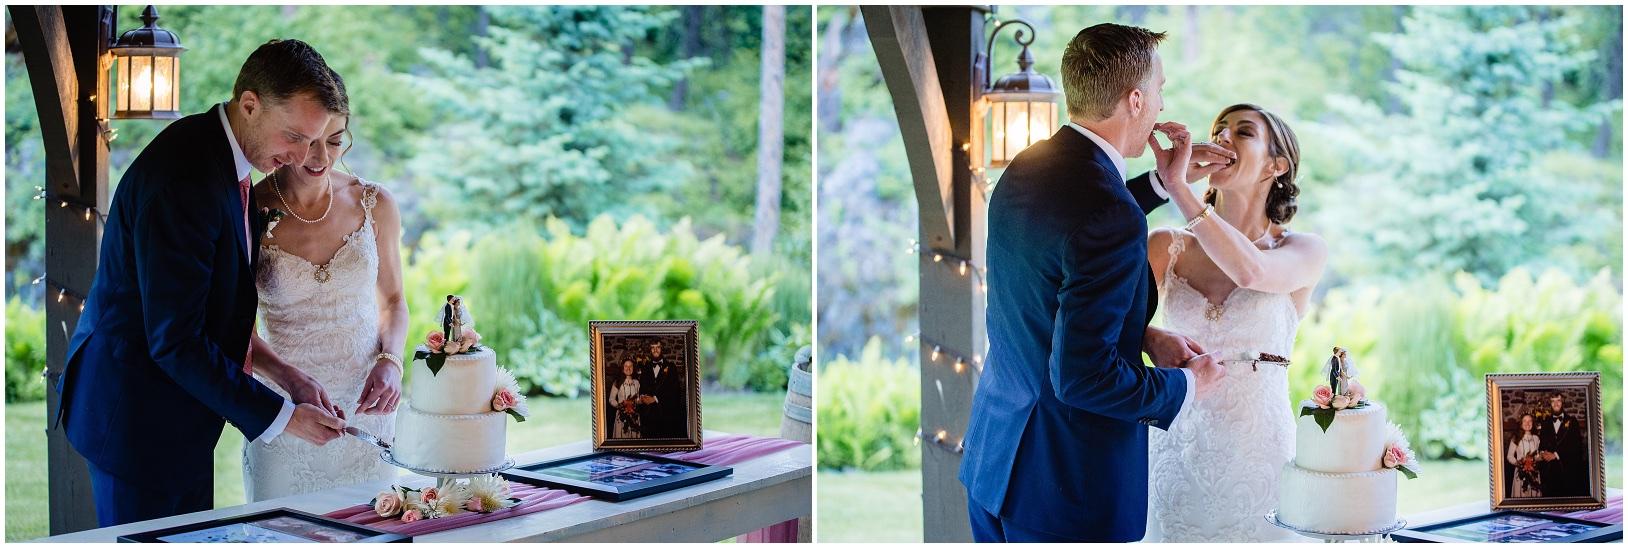 lindseyjanephoto_wedding0114.jpg